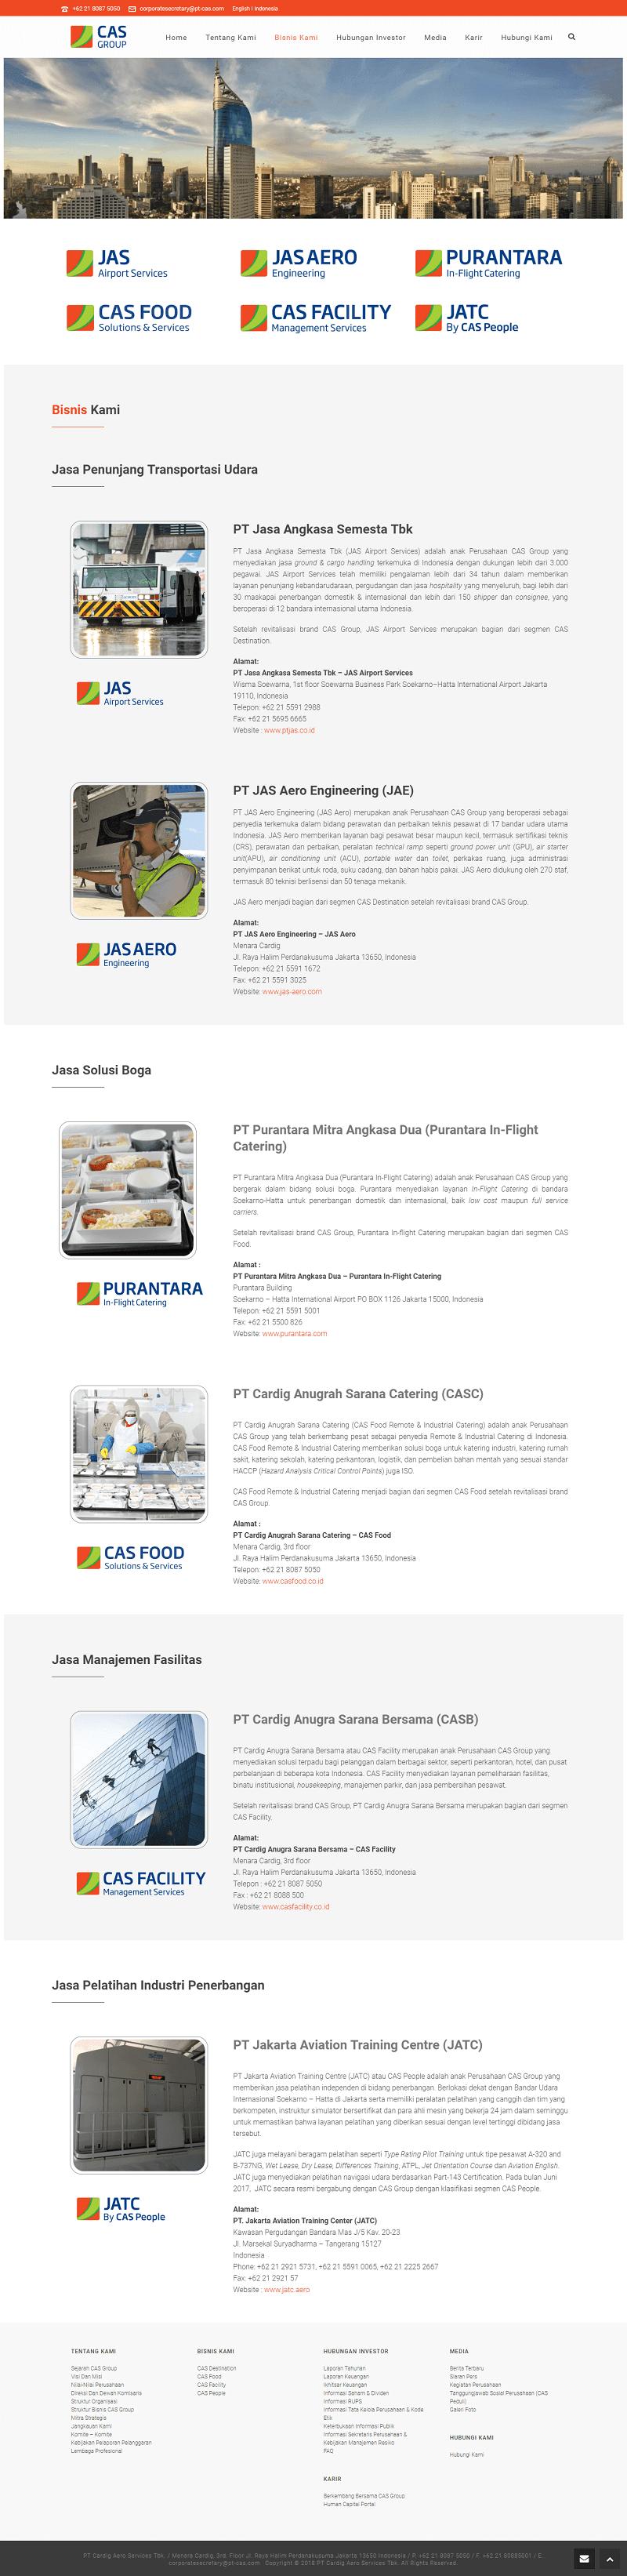 portofolio-jasa-pembuatan-website-website-company-profile-capture-cas-group-3